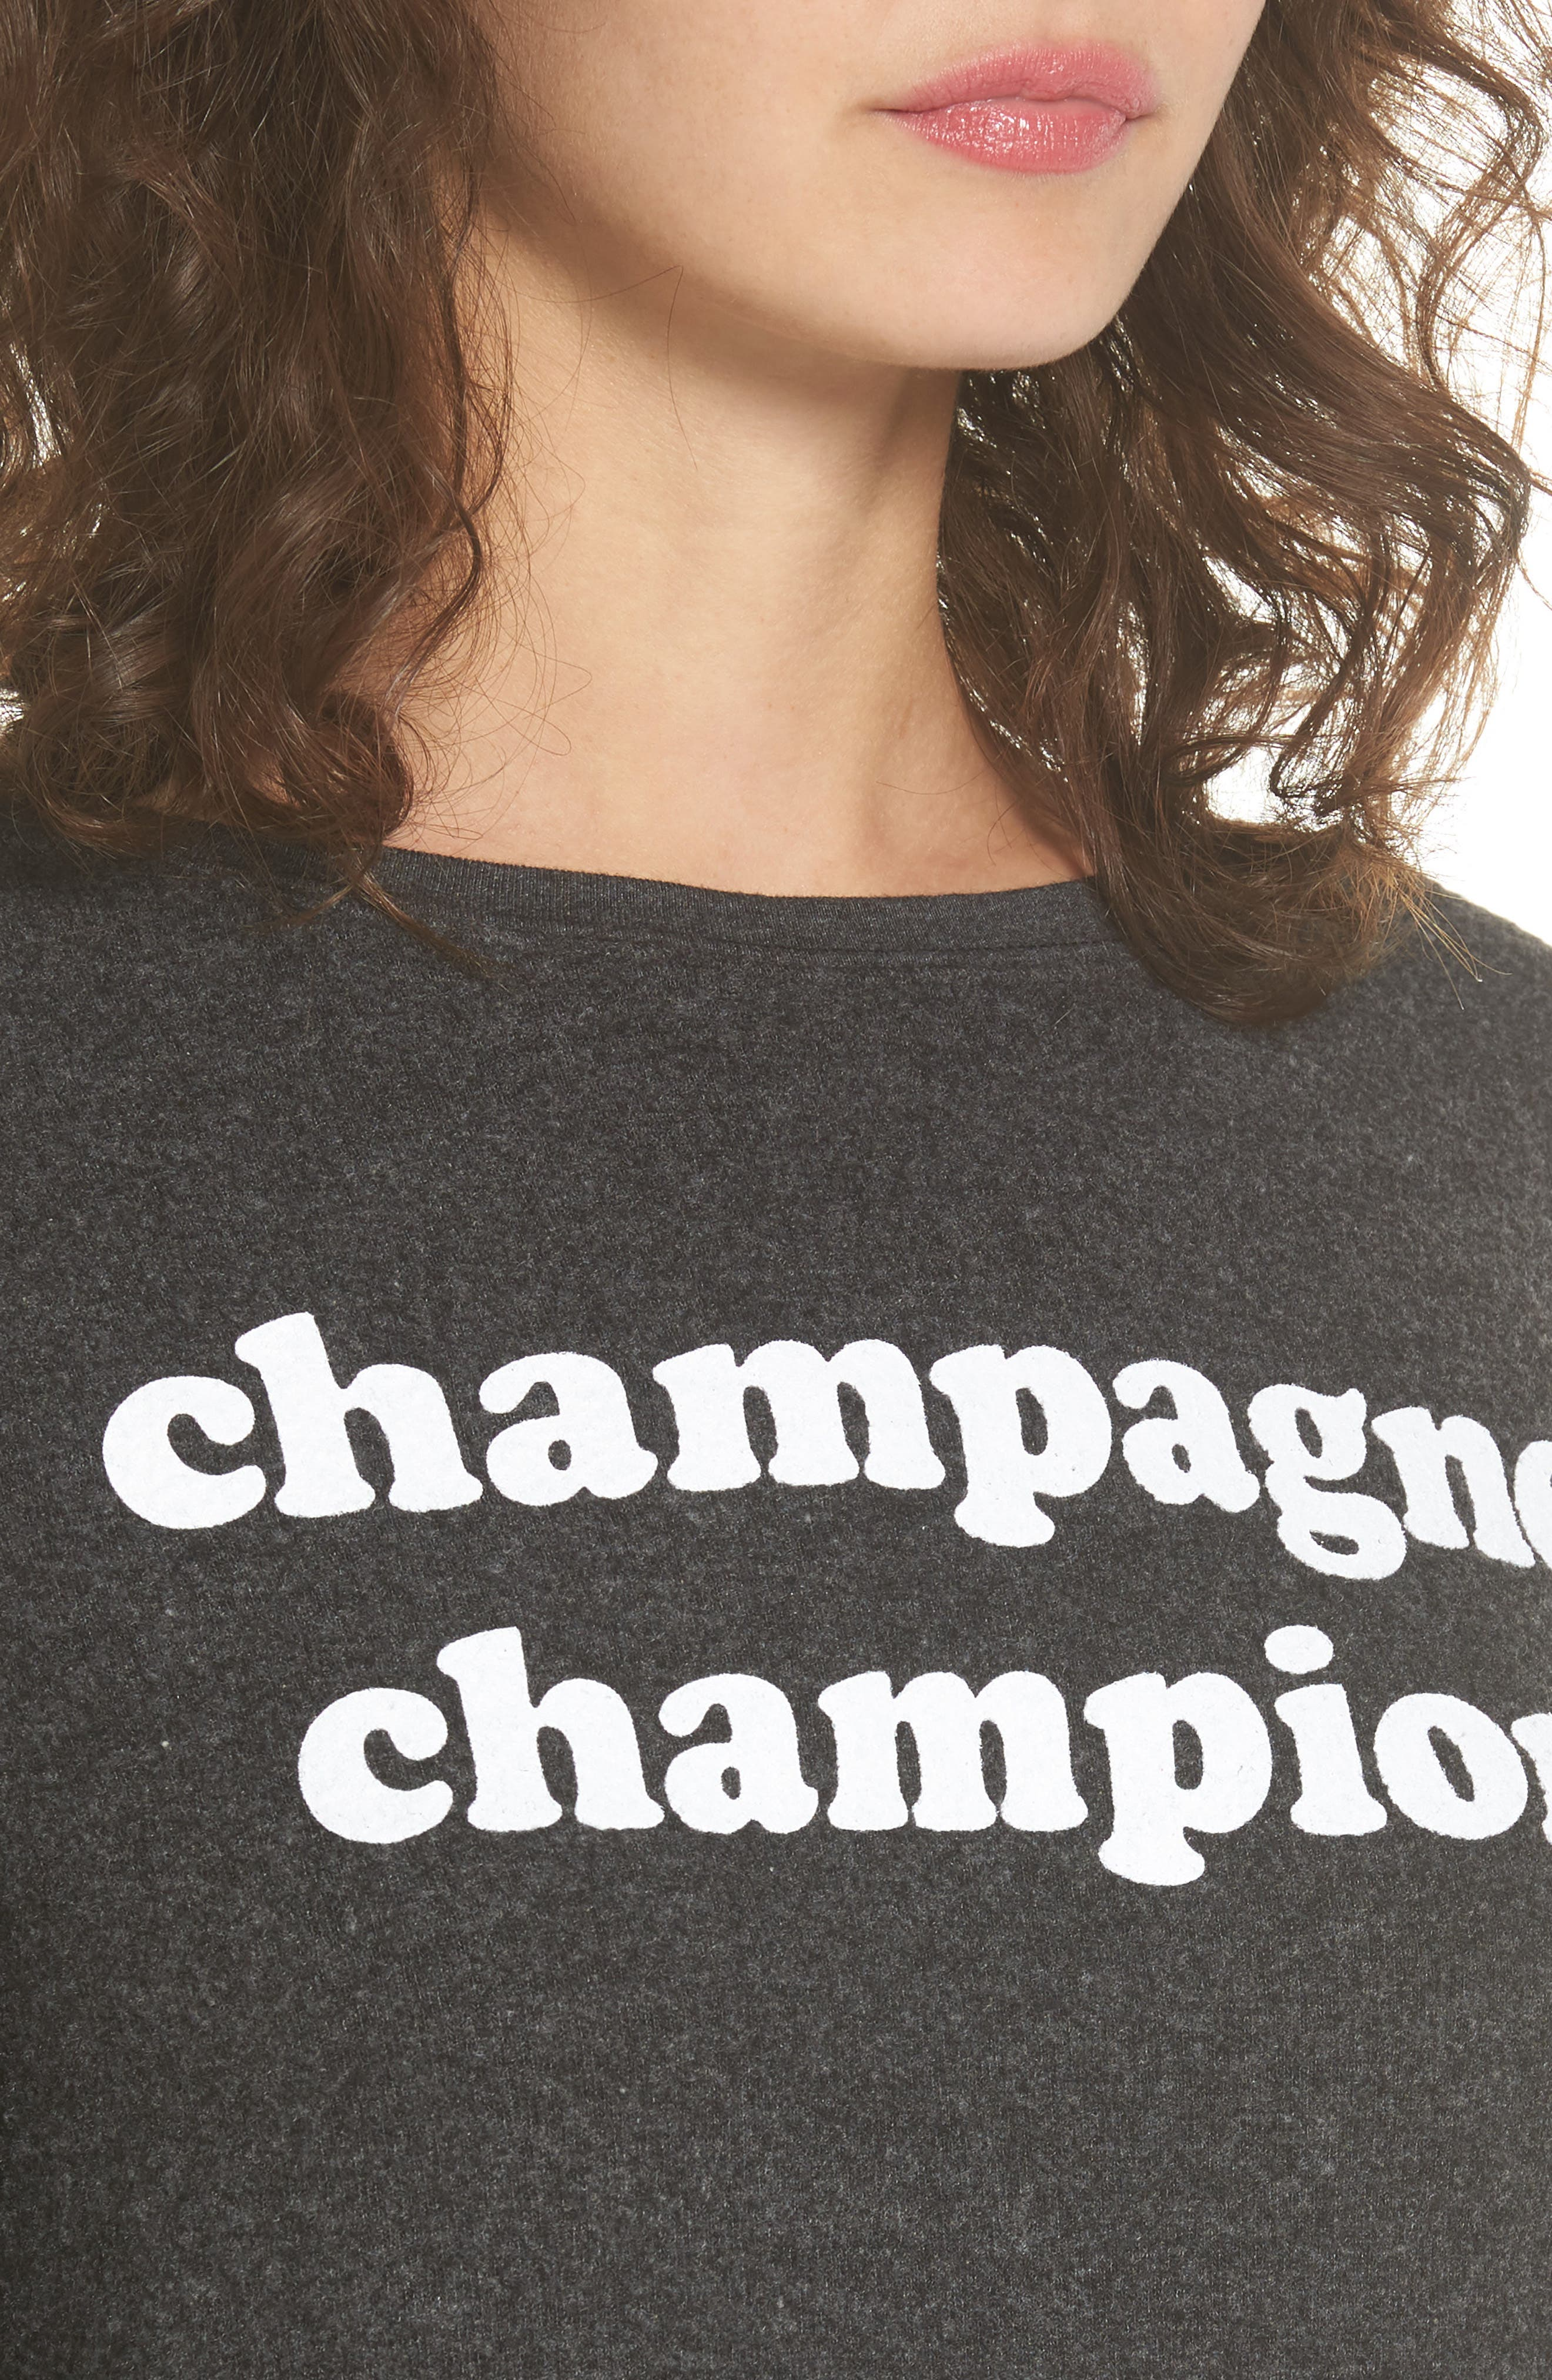 Champagne Champion Sweatshirt,                             Alternate thumbnail 4, color,                             001